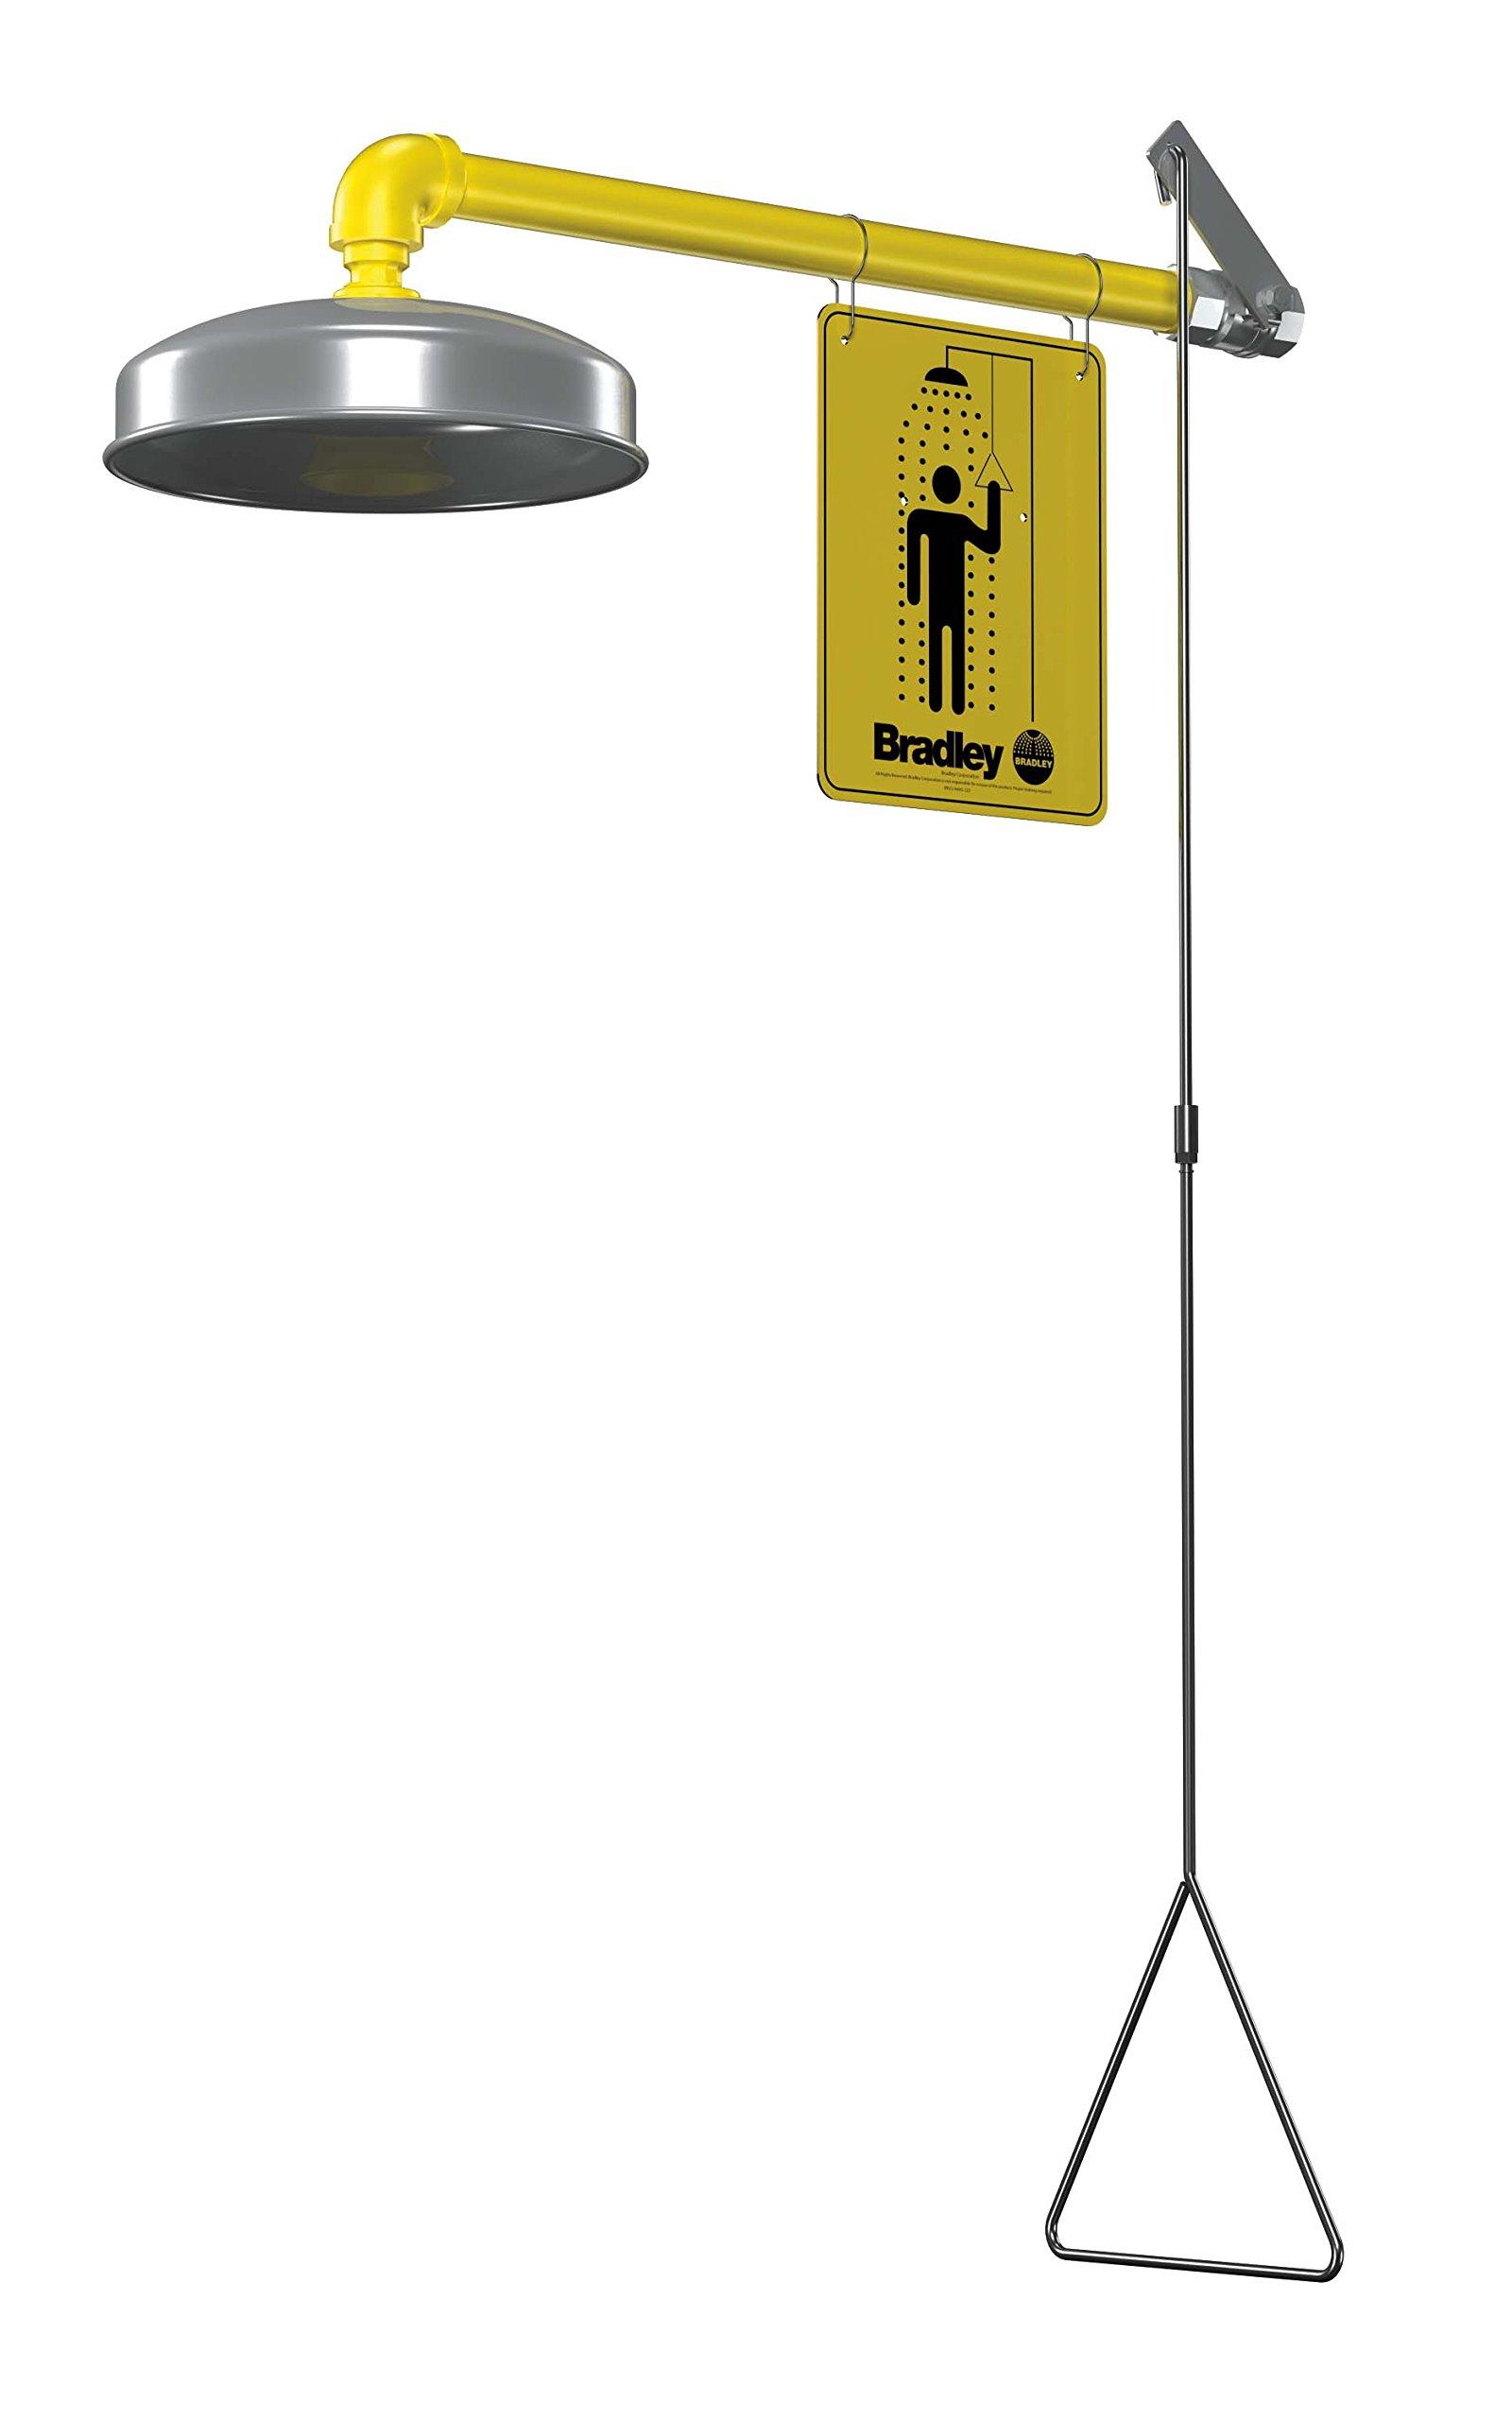 Bradley S19-120ABF Galvanized Steel 1 Spray Head Barrier Free Safety Shower with Stainless Steel Showerhead, Wall Mount, 20 GPM Water Flow, 9'' Width x 45'' Height x 24'' Depth